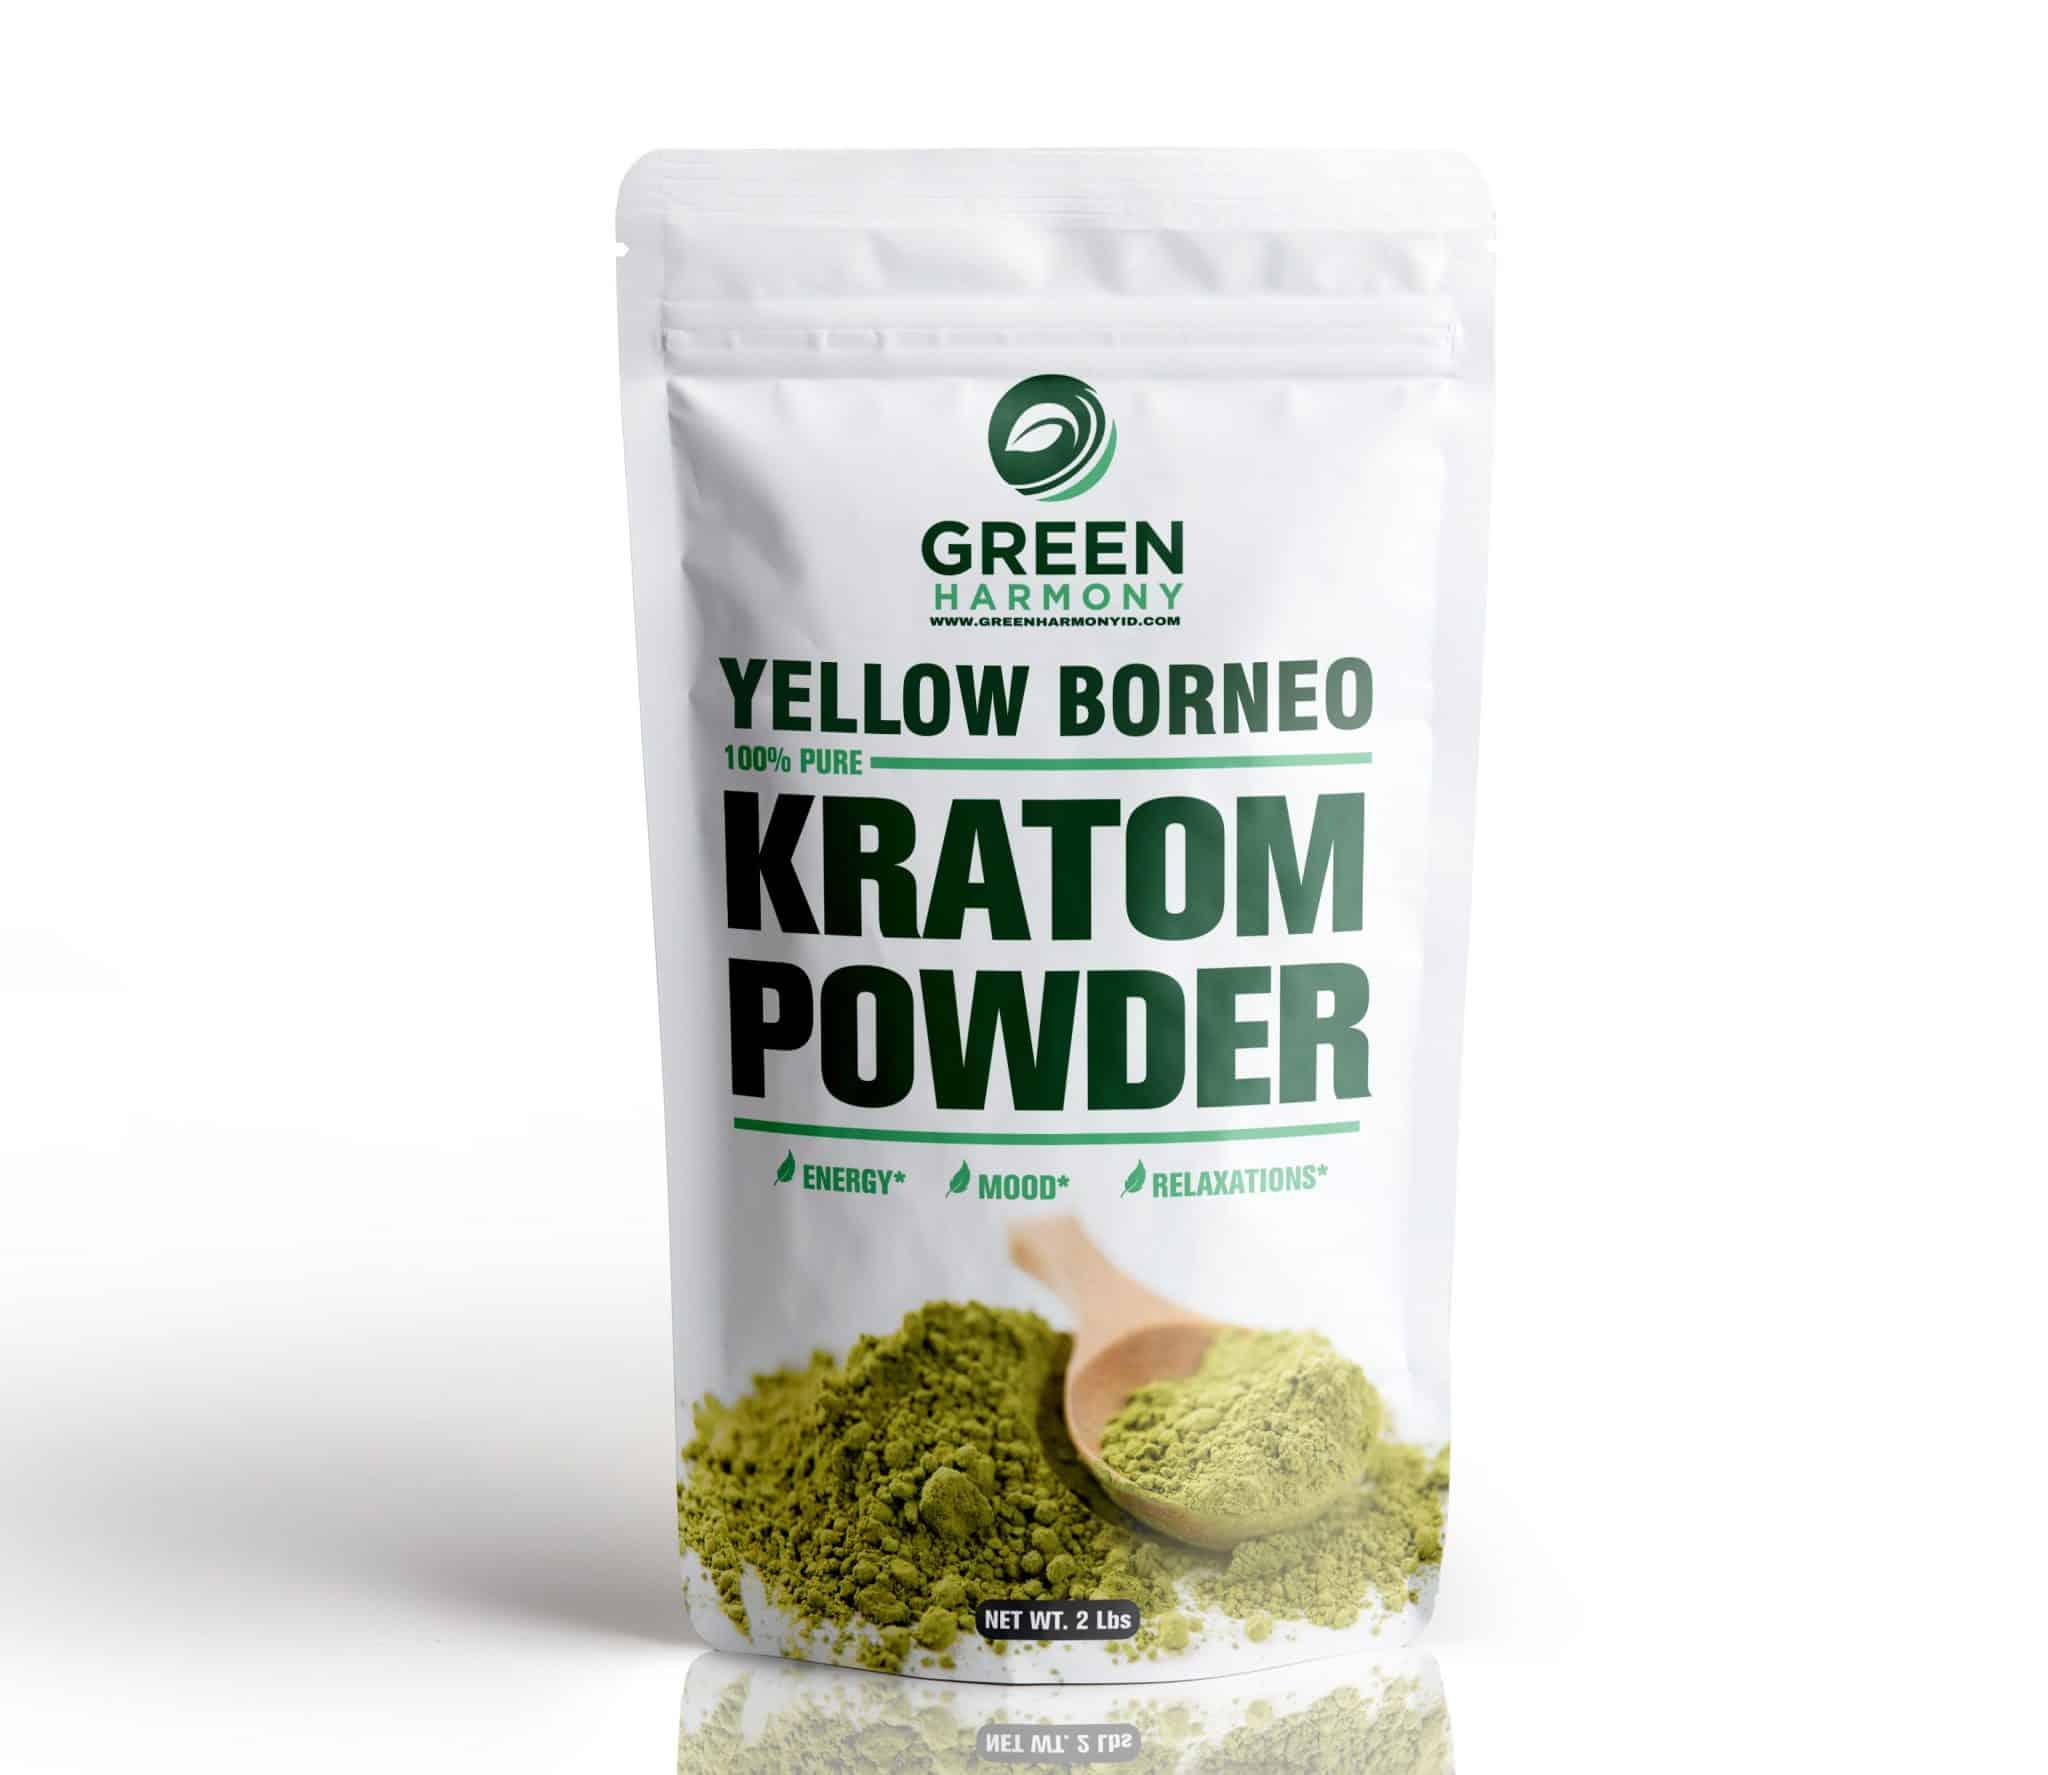 Yellow Borneo Kratom Powder - Green Harmony Indonesia Kratom Vendor - buy kratom online with confidence